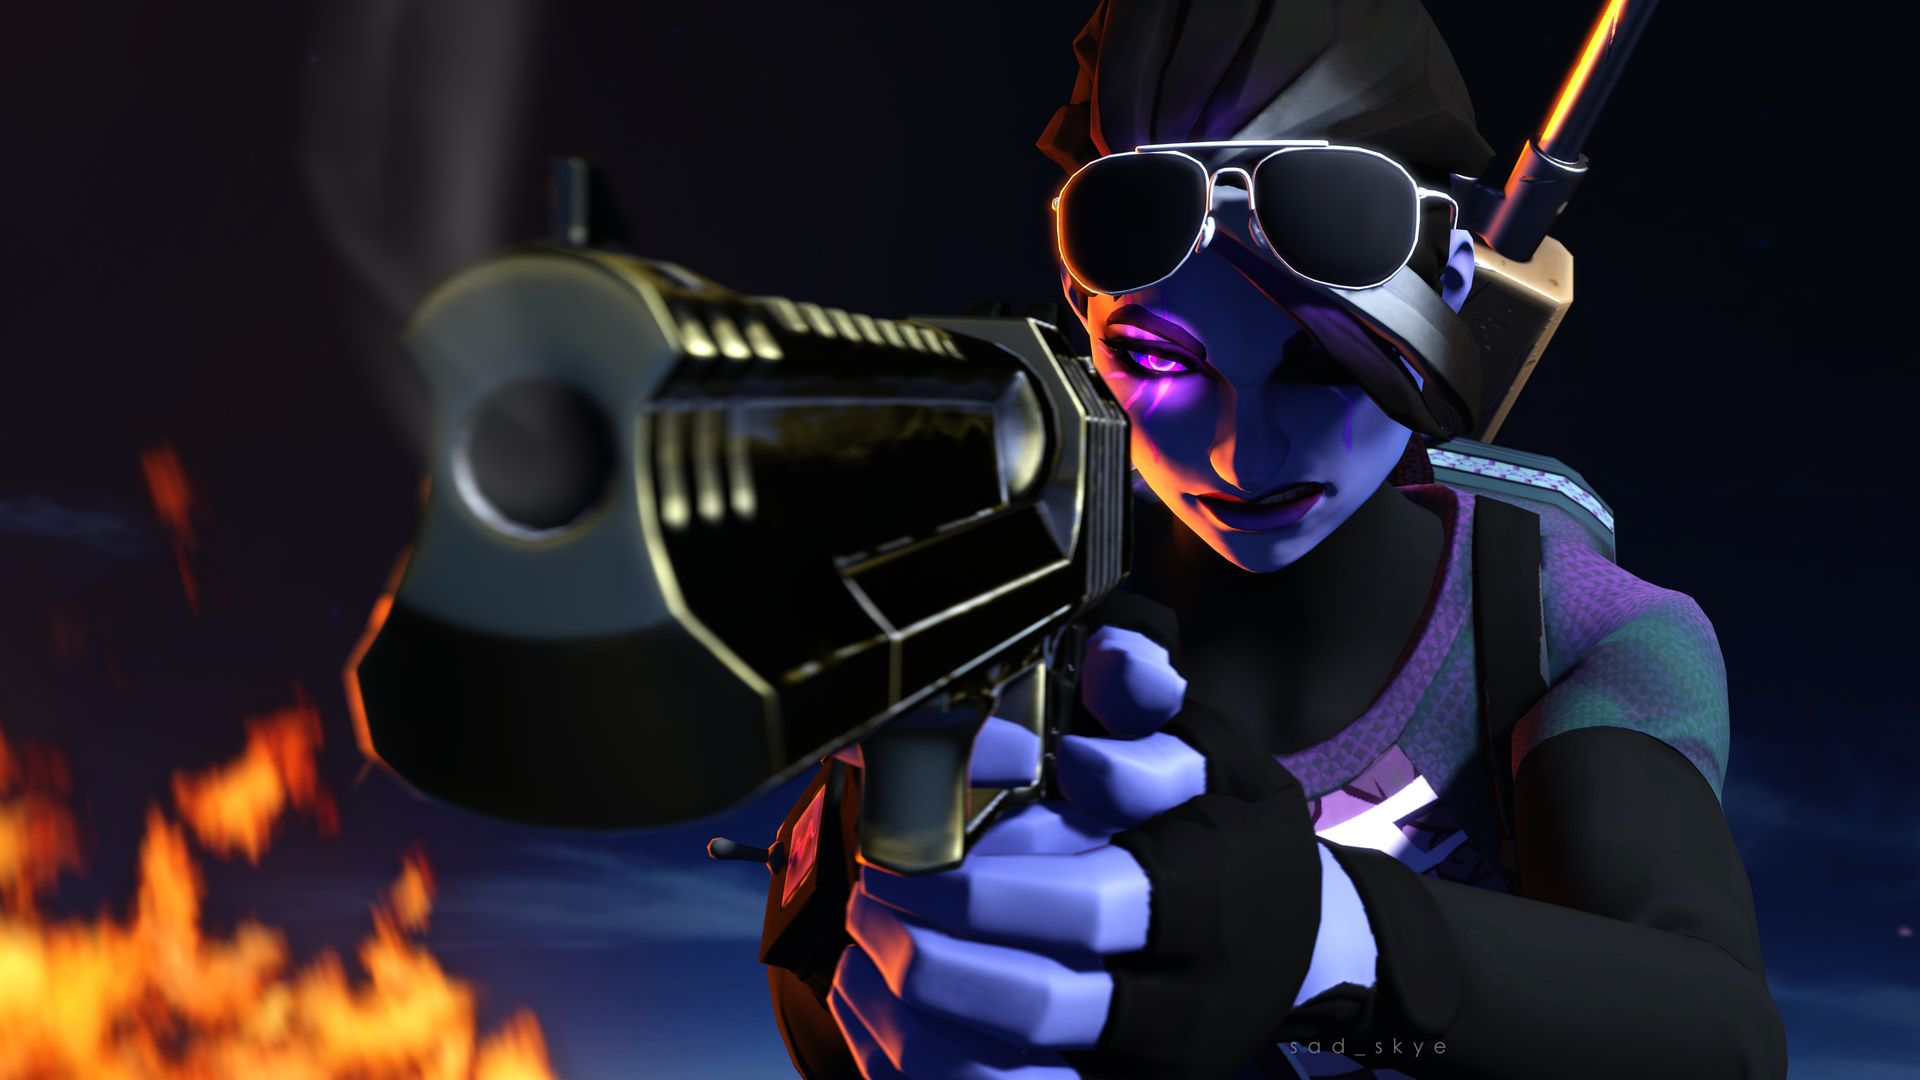 Dark Bomber Pistol Fortnite Battle Royale Game 11113 En 2020 Image Jeux Video Fond D Ecran Telephone Fortnite Fond Ecran